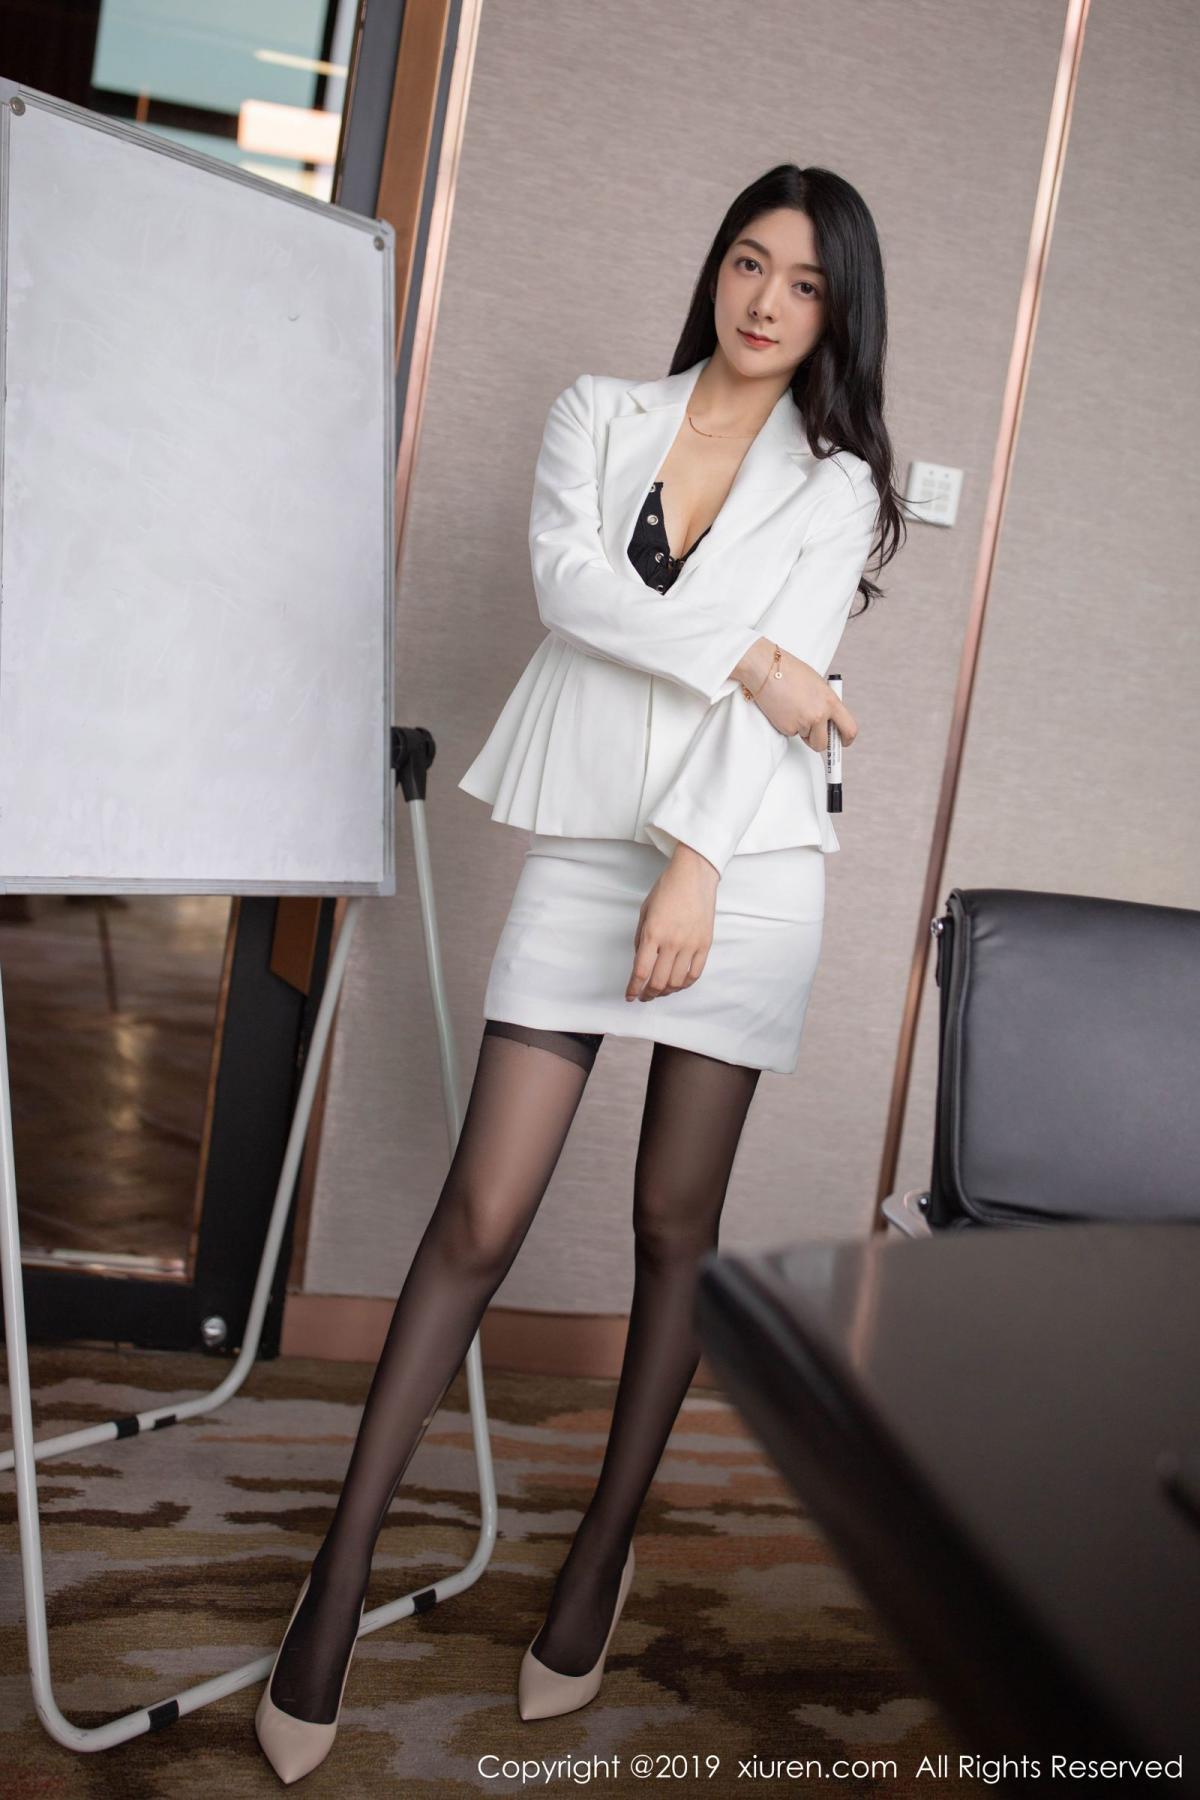 [XiuRen] Vol.1821 Come to my room and sit after you get off work 8P, Black Silk, Di Yi, Xiuren